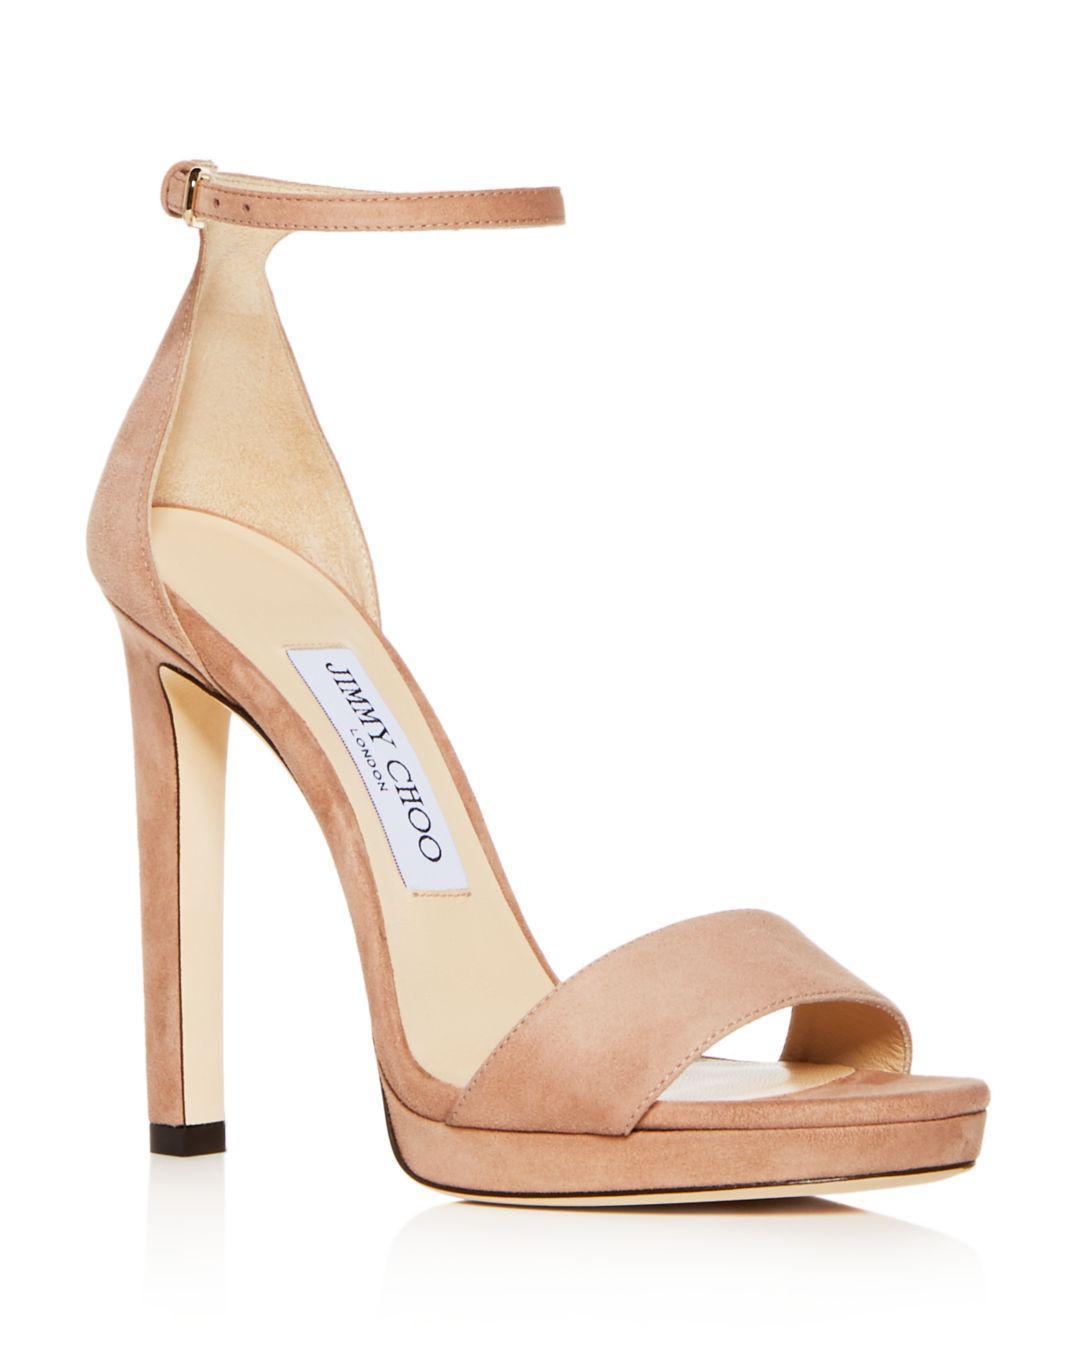 46b27cdd6b5 Jimmy Choo - Multicolor Women s Misty 120 Suede High-heel Platform Sandals  - Lyst. View fullscreen